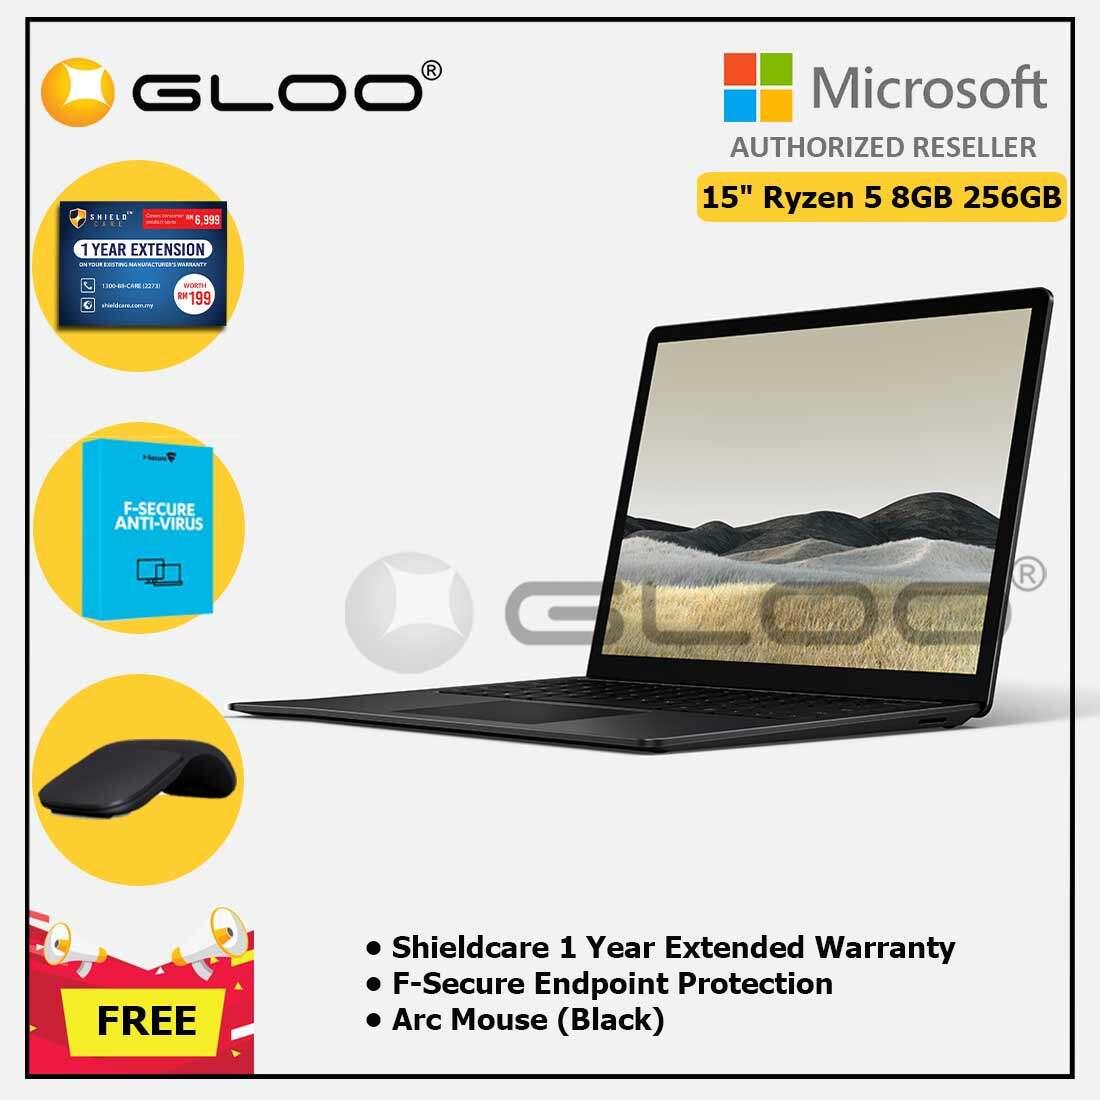 Microsoft Surface Laptop 3 15  Ryzen 5/8GB RAM - 256GB Black + Shield Care 1 Year + F-Secure 1 Year + Arc Mouse Black Malaysia